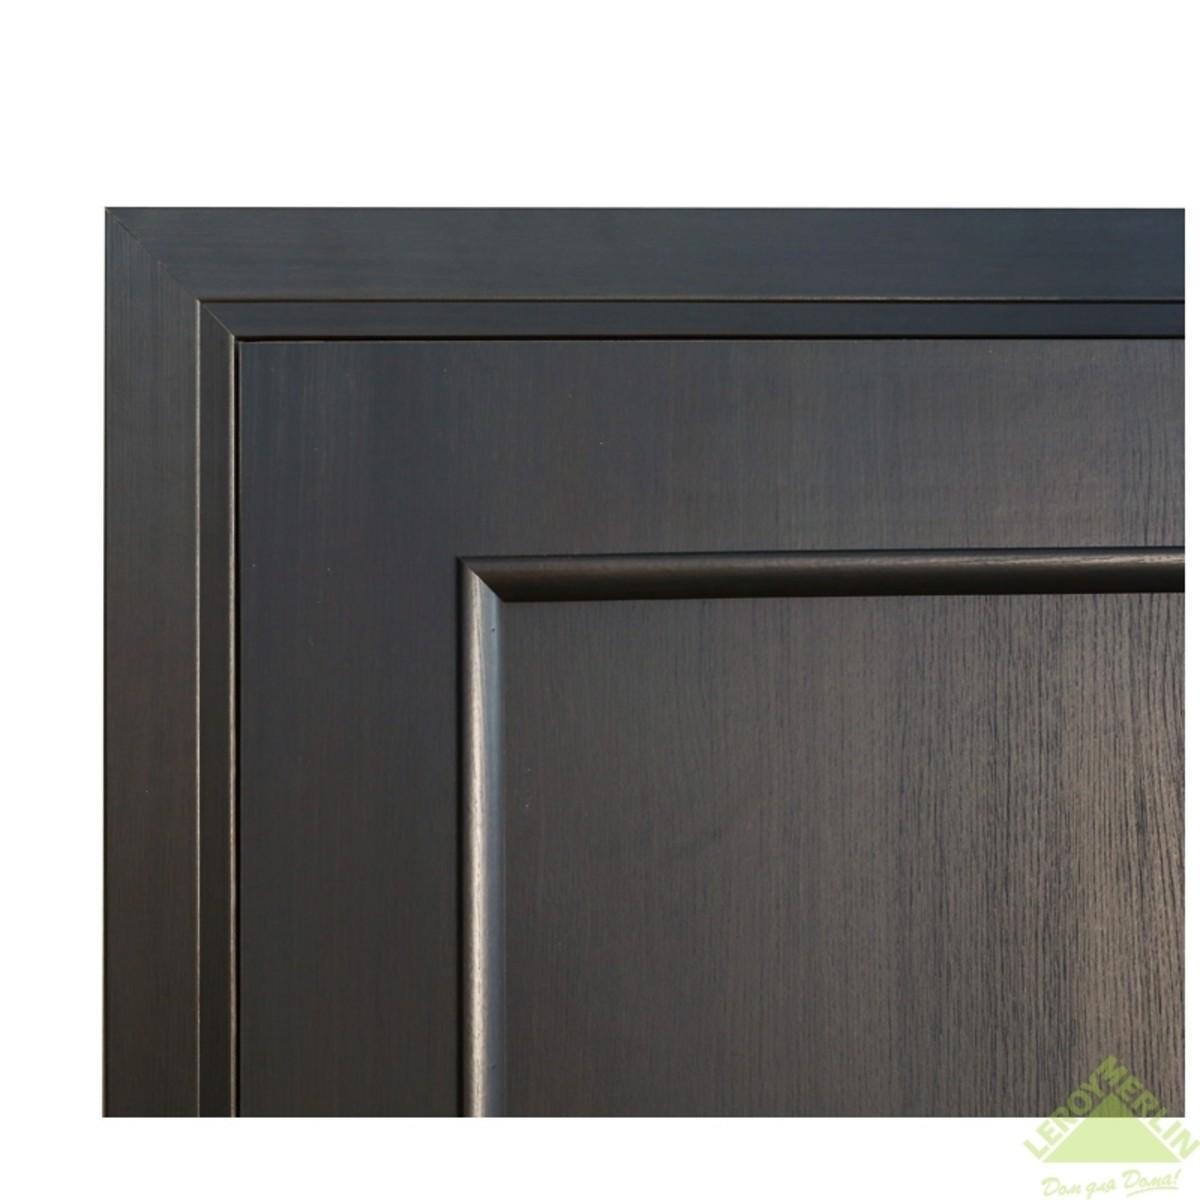 Дверь Межкомнатная Глухая Фортунато 820 600x2000 Венге